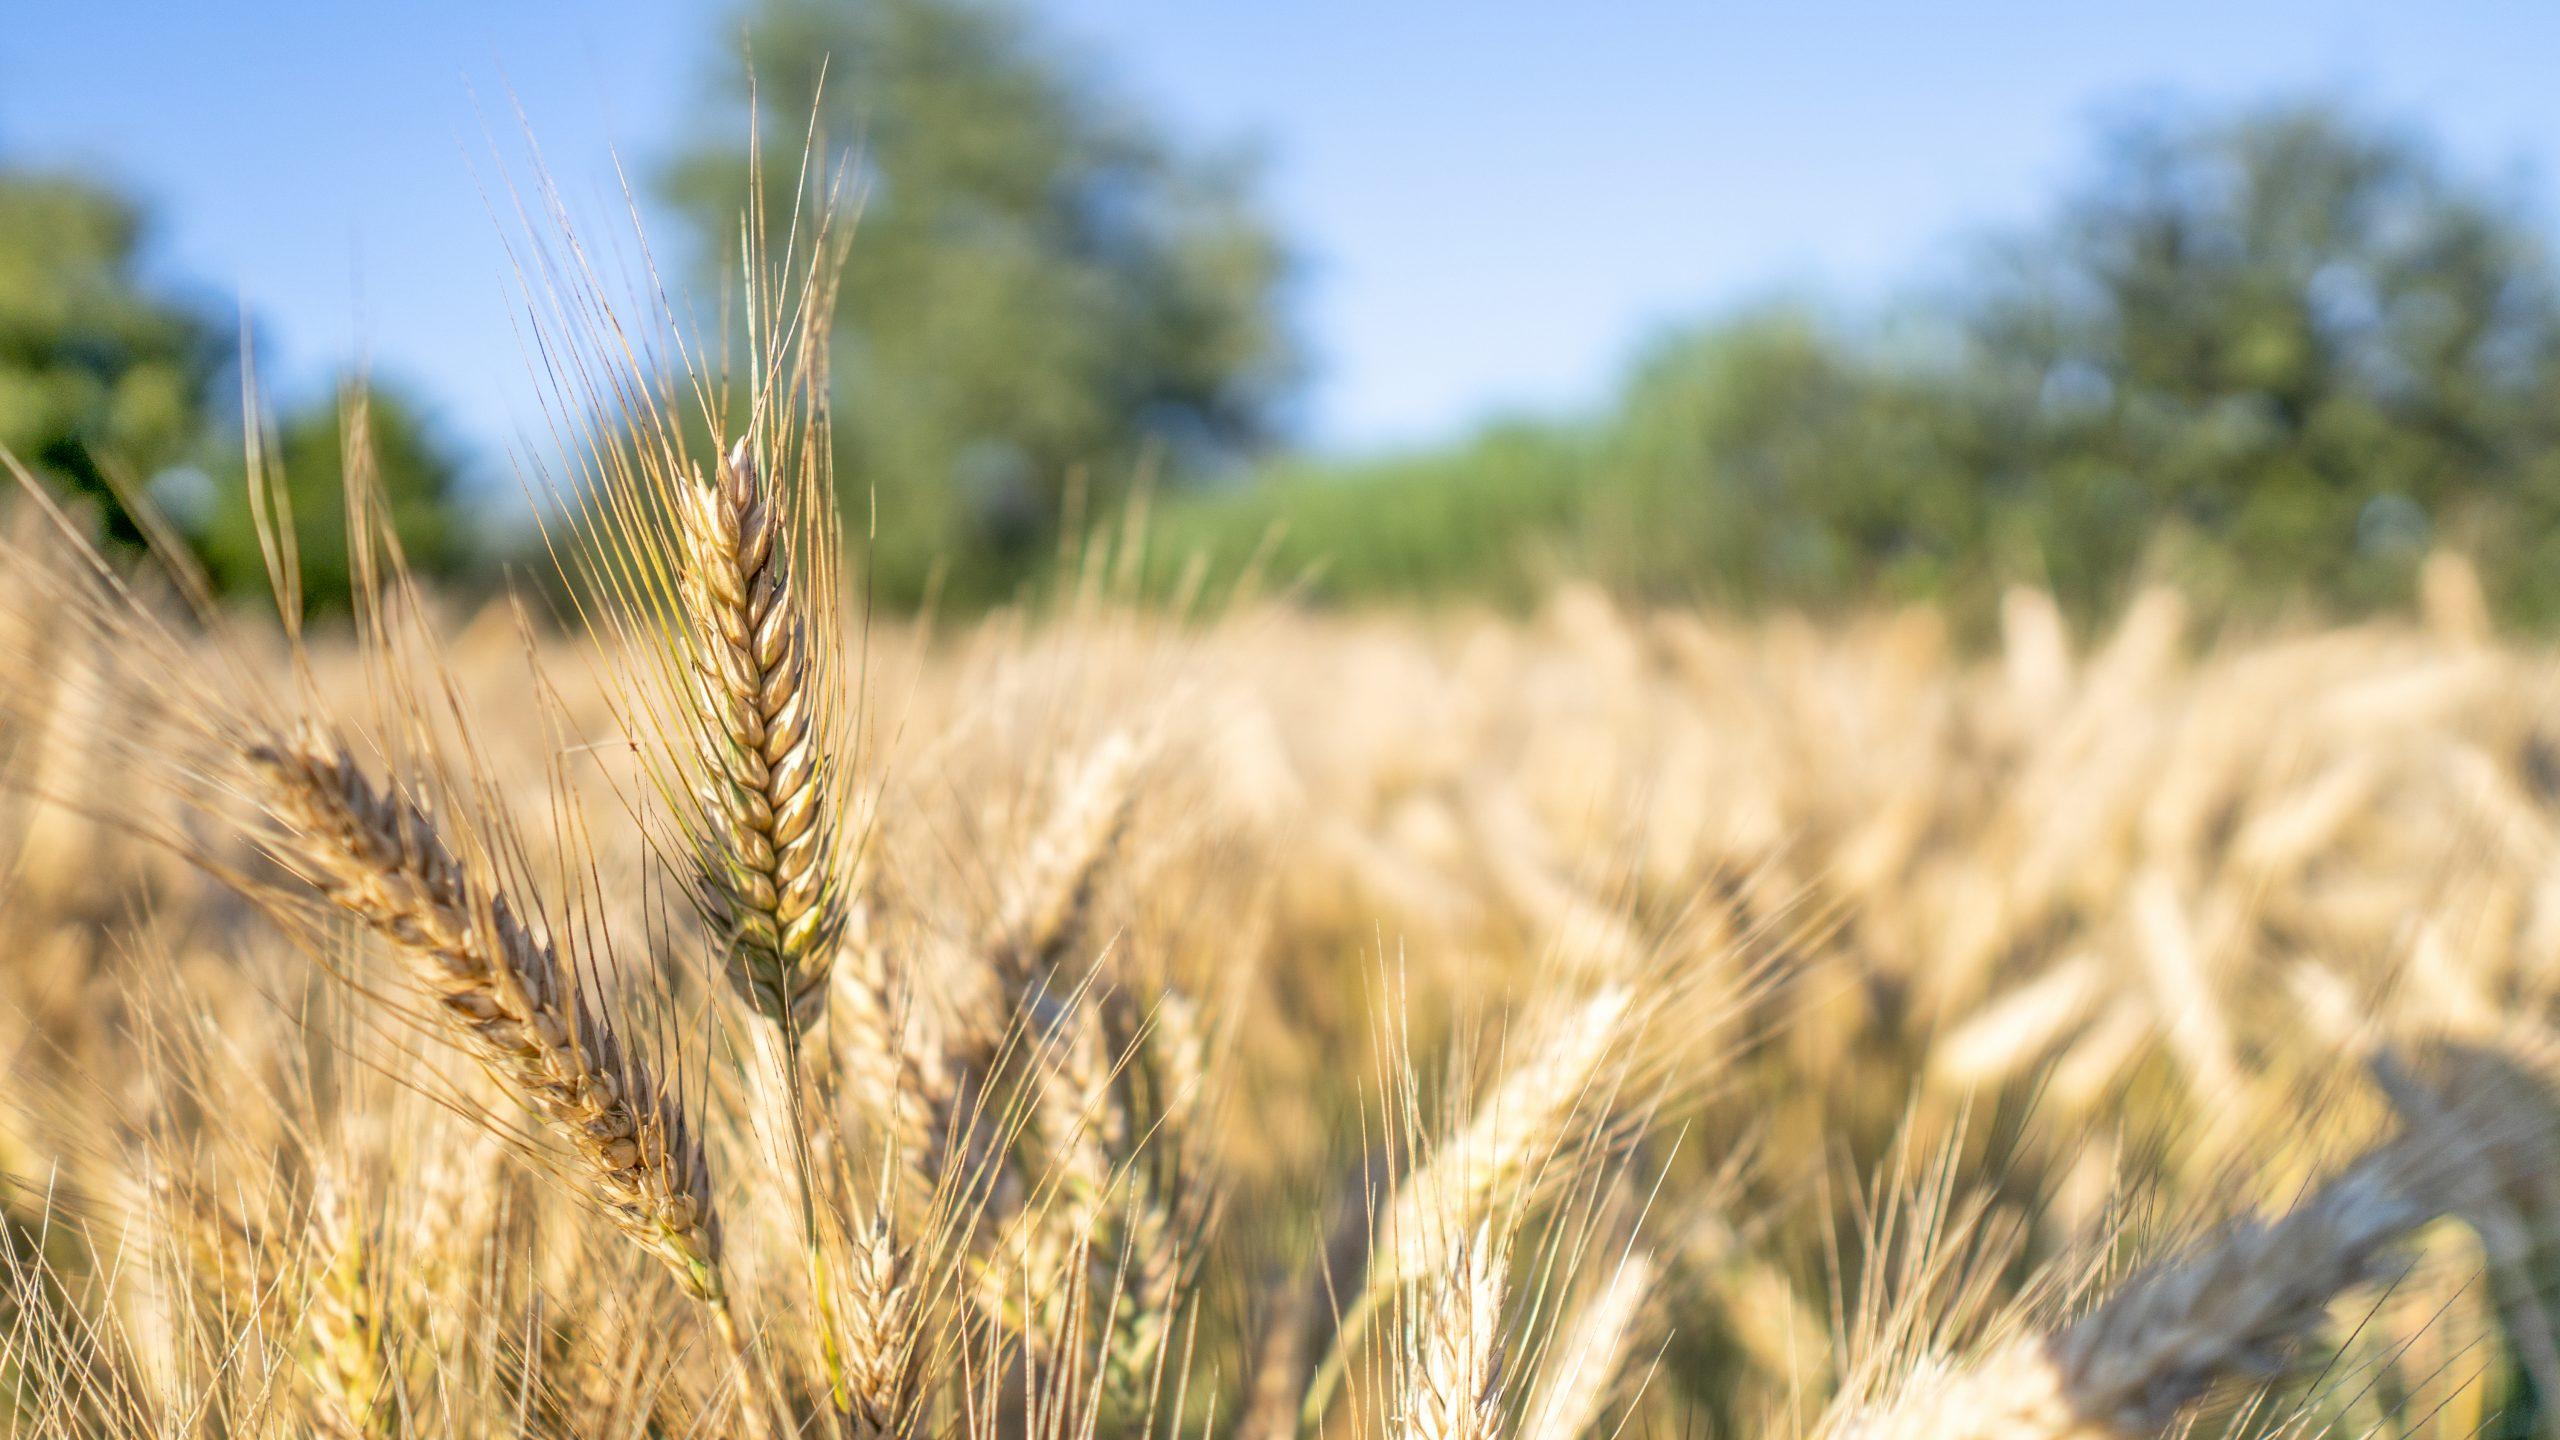 Wheat field on the Farm